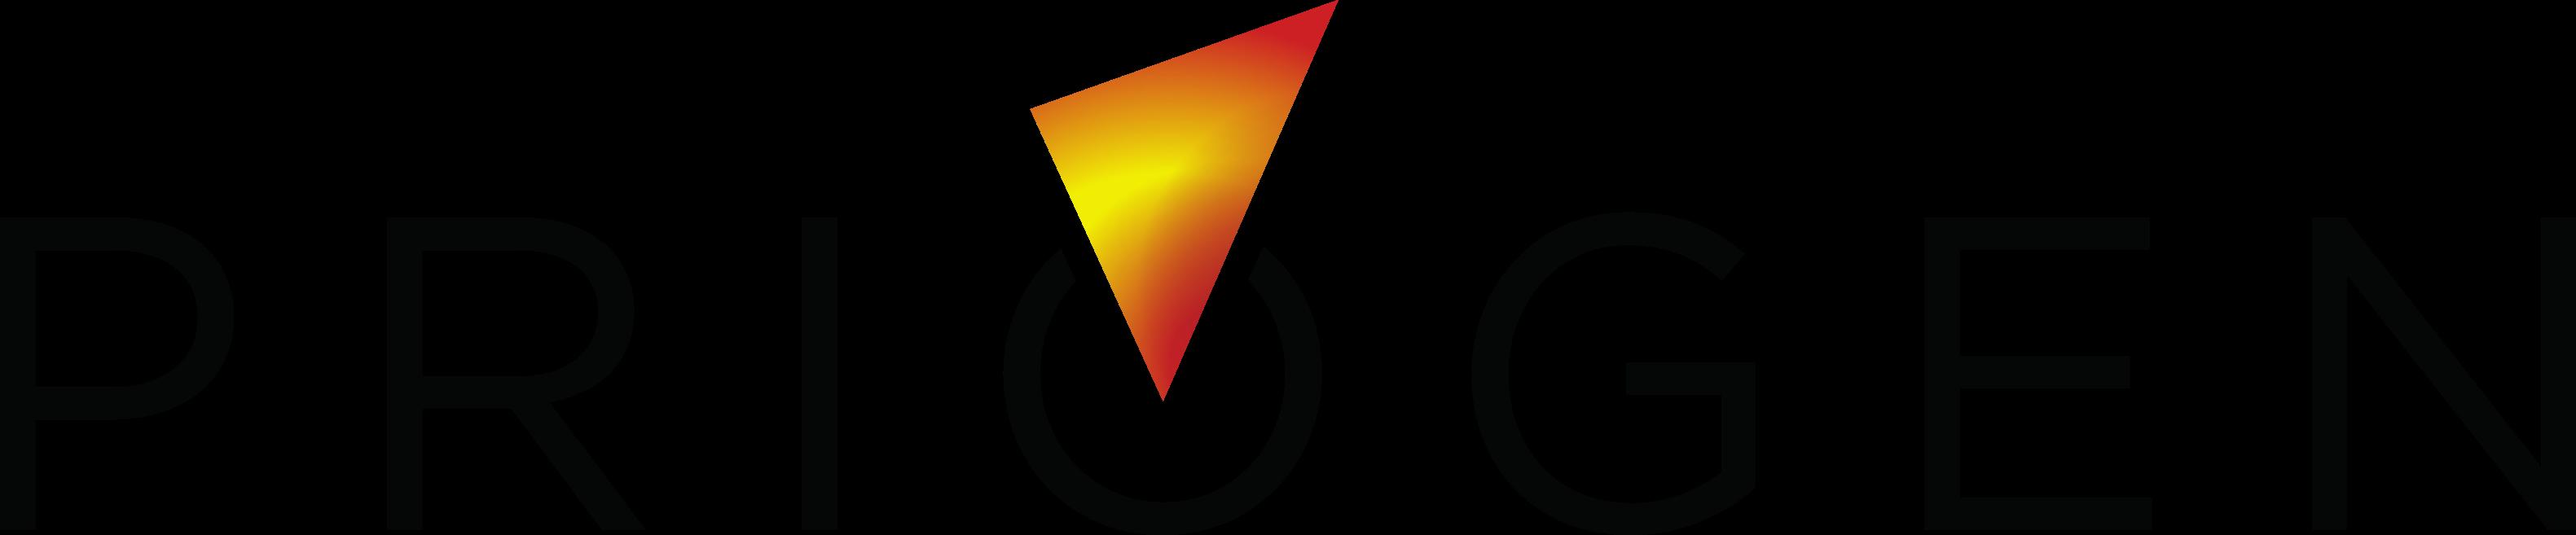 Priogen logo